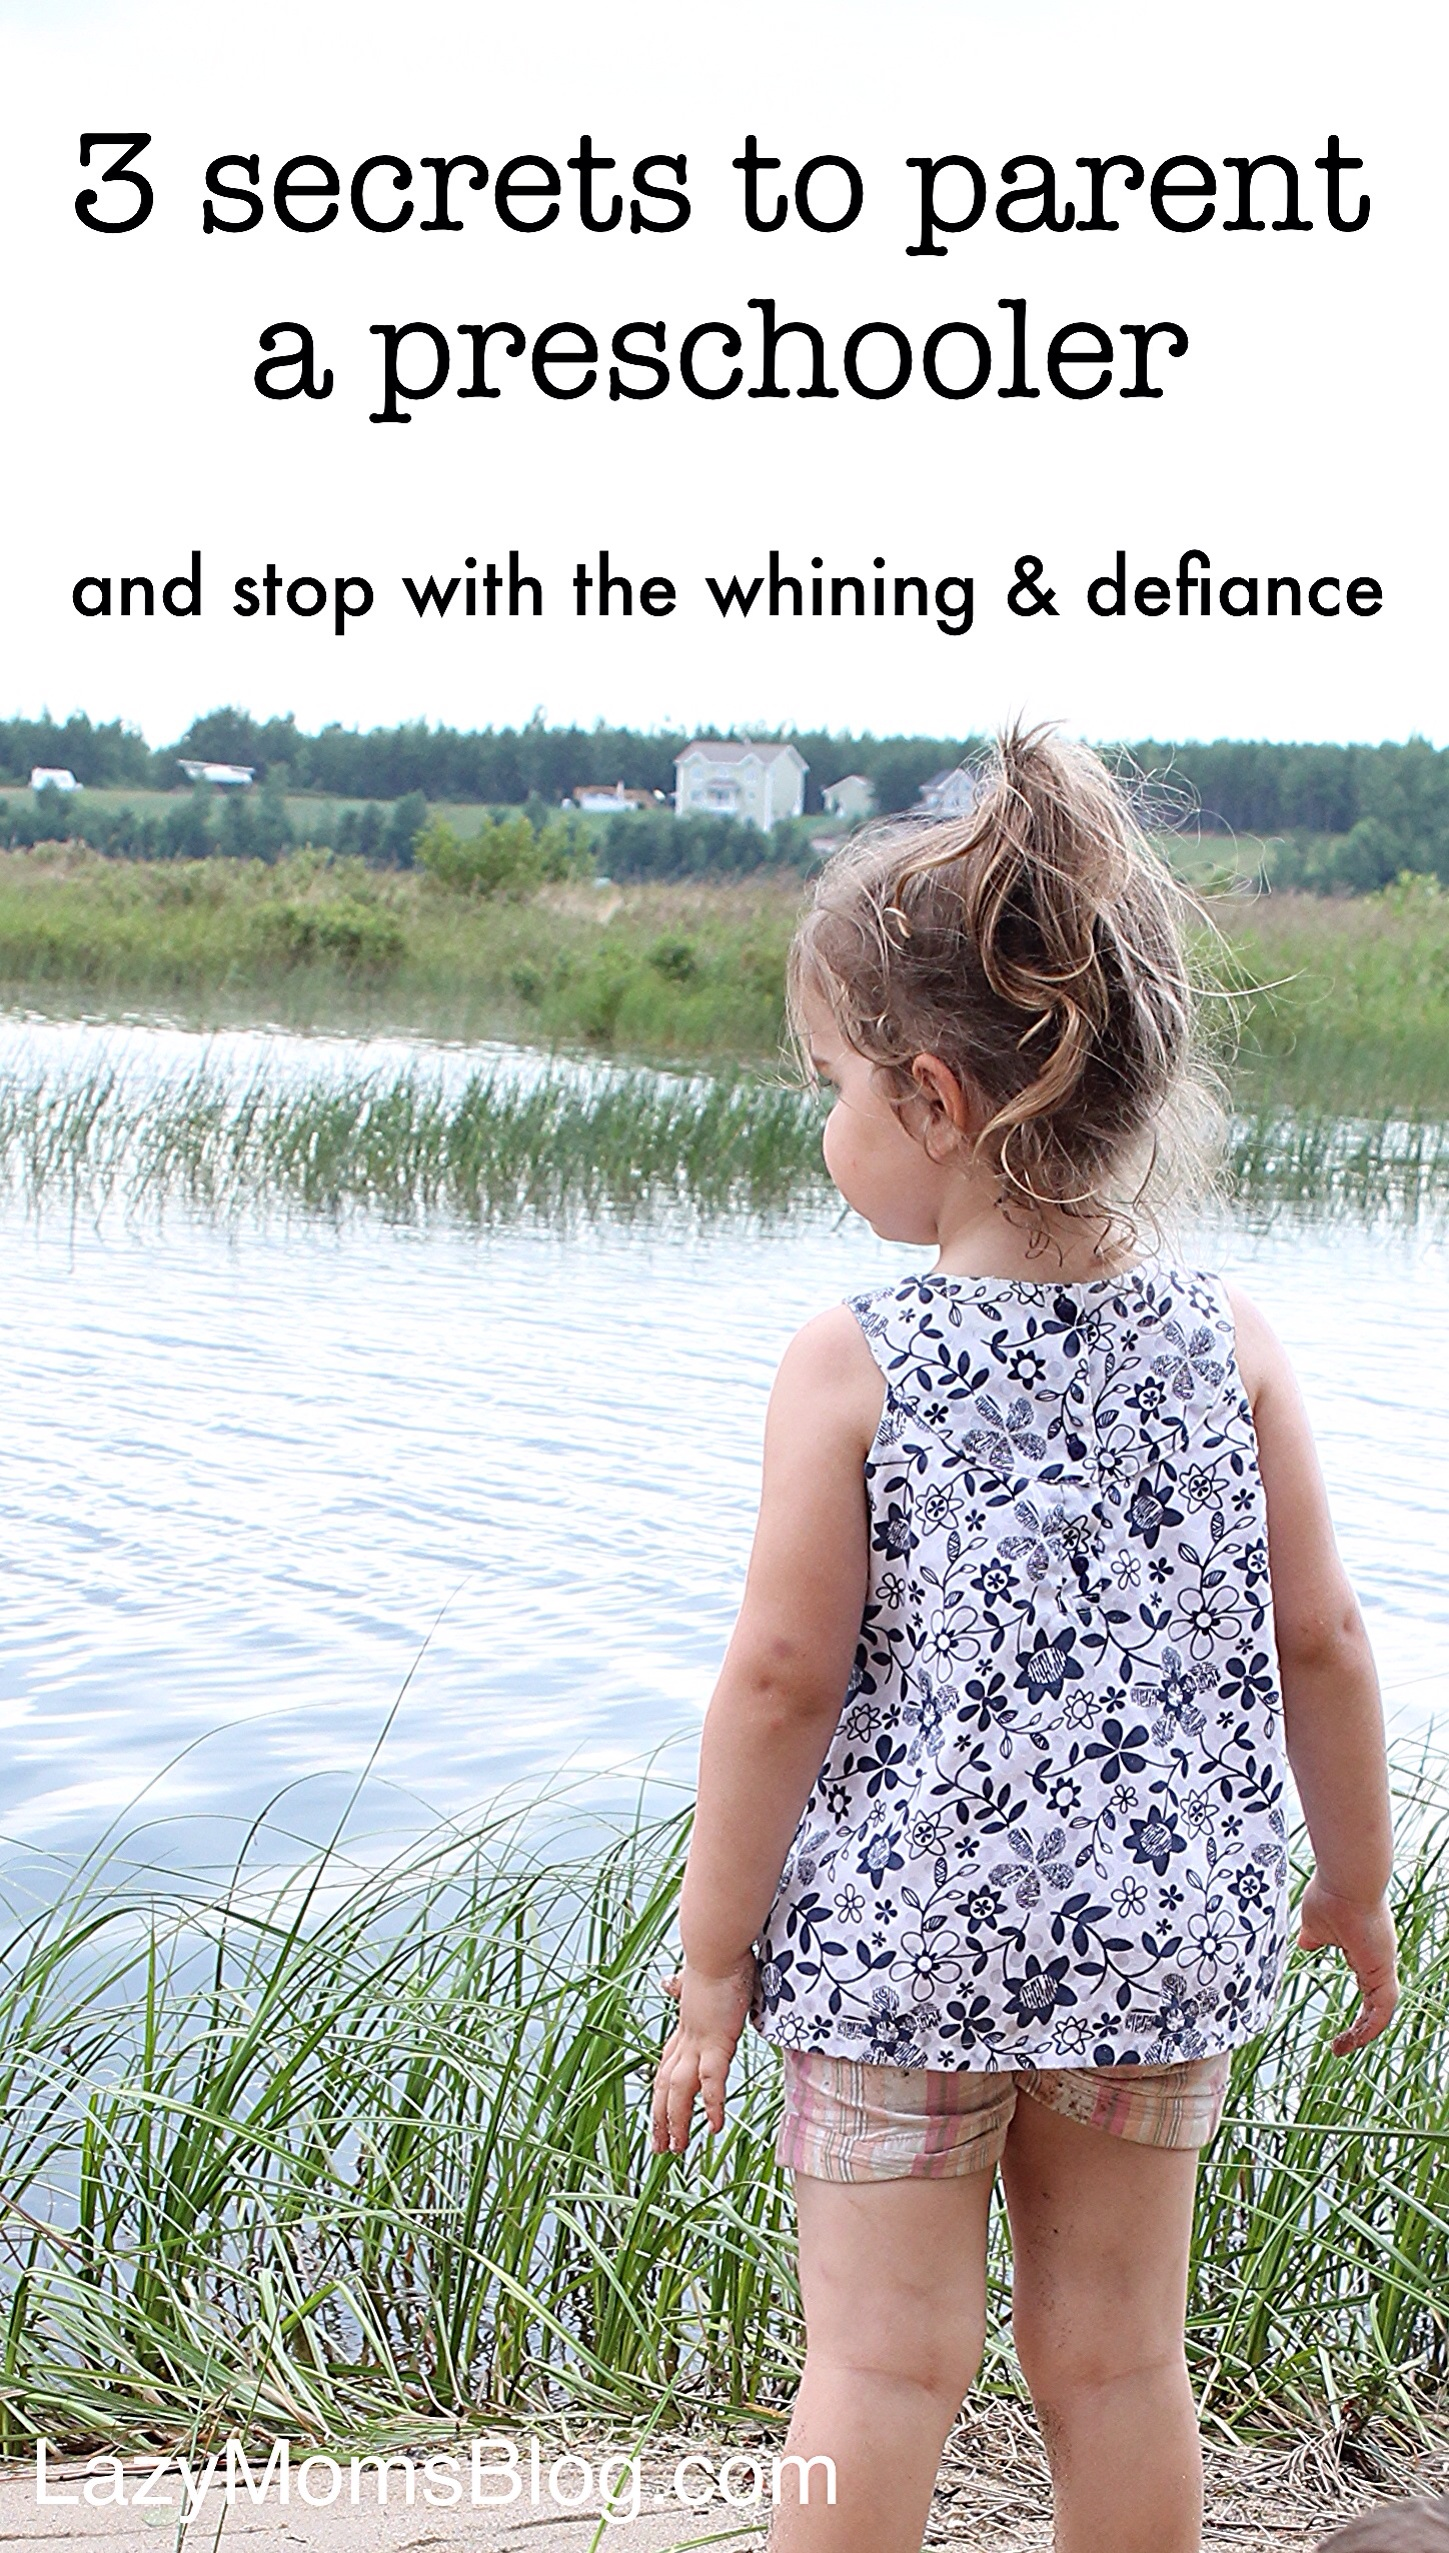 3 secrets to parent a preschooler without the drama